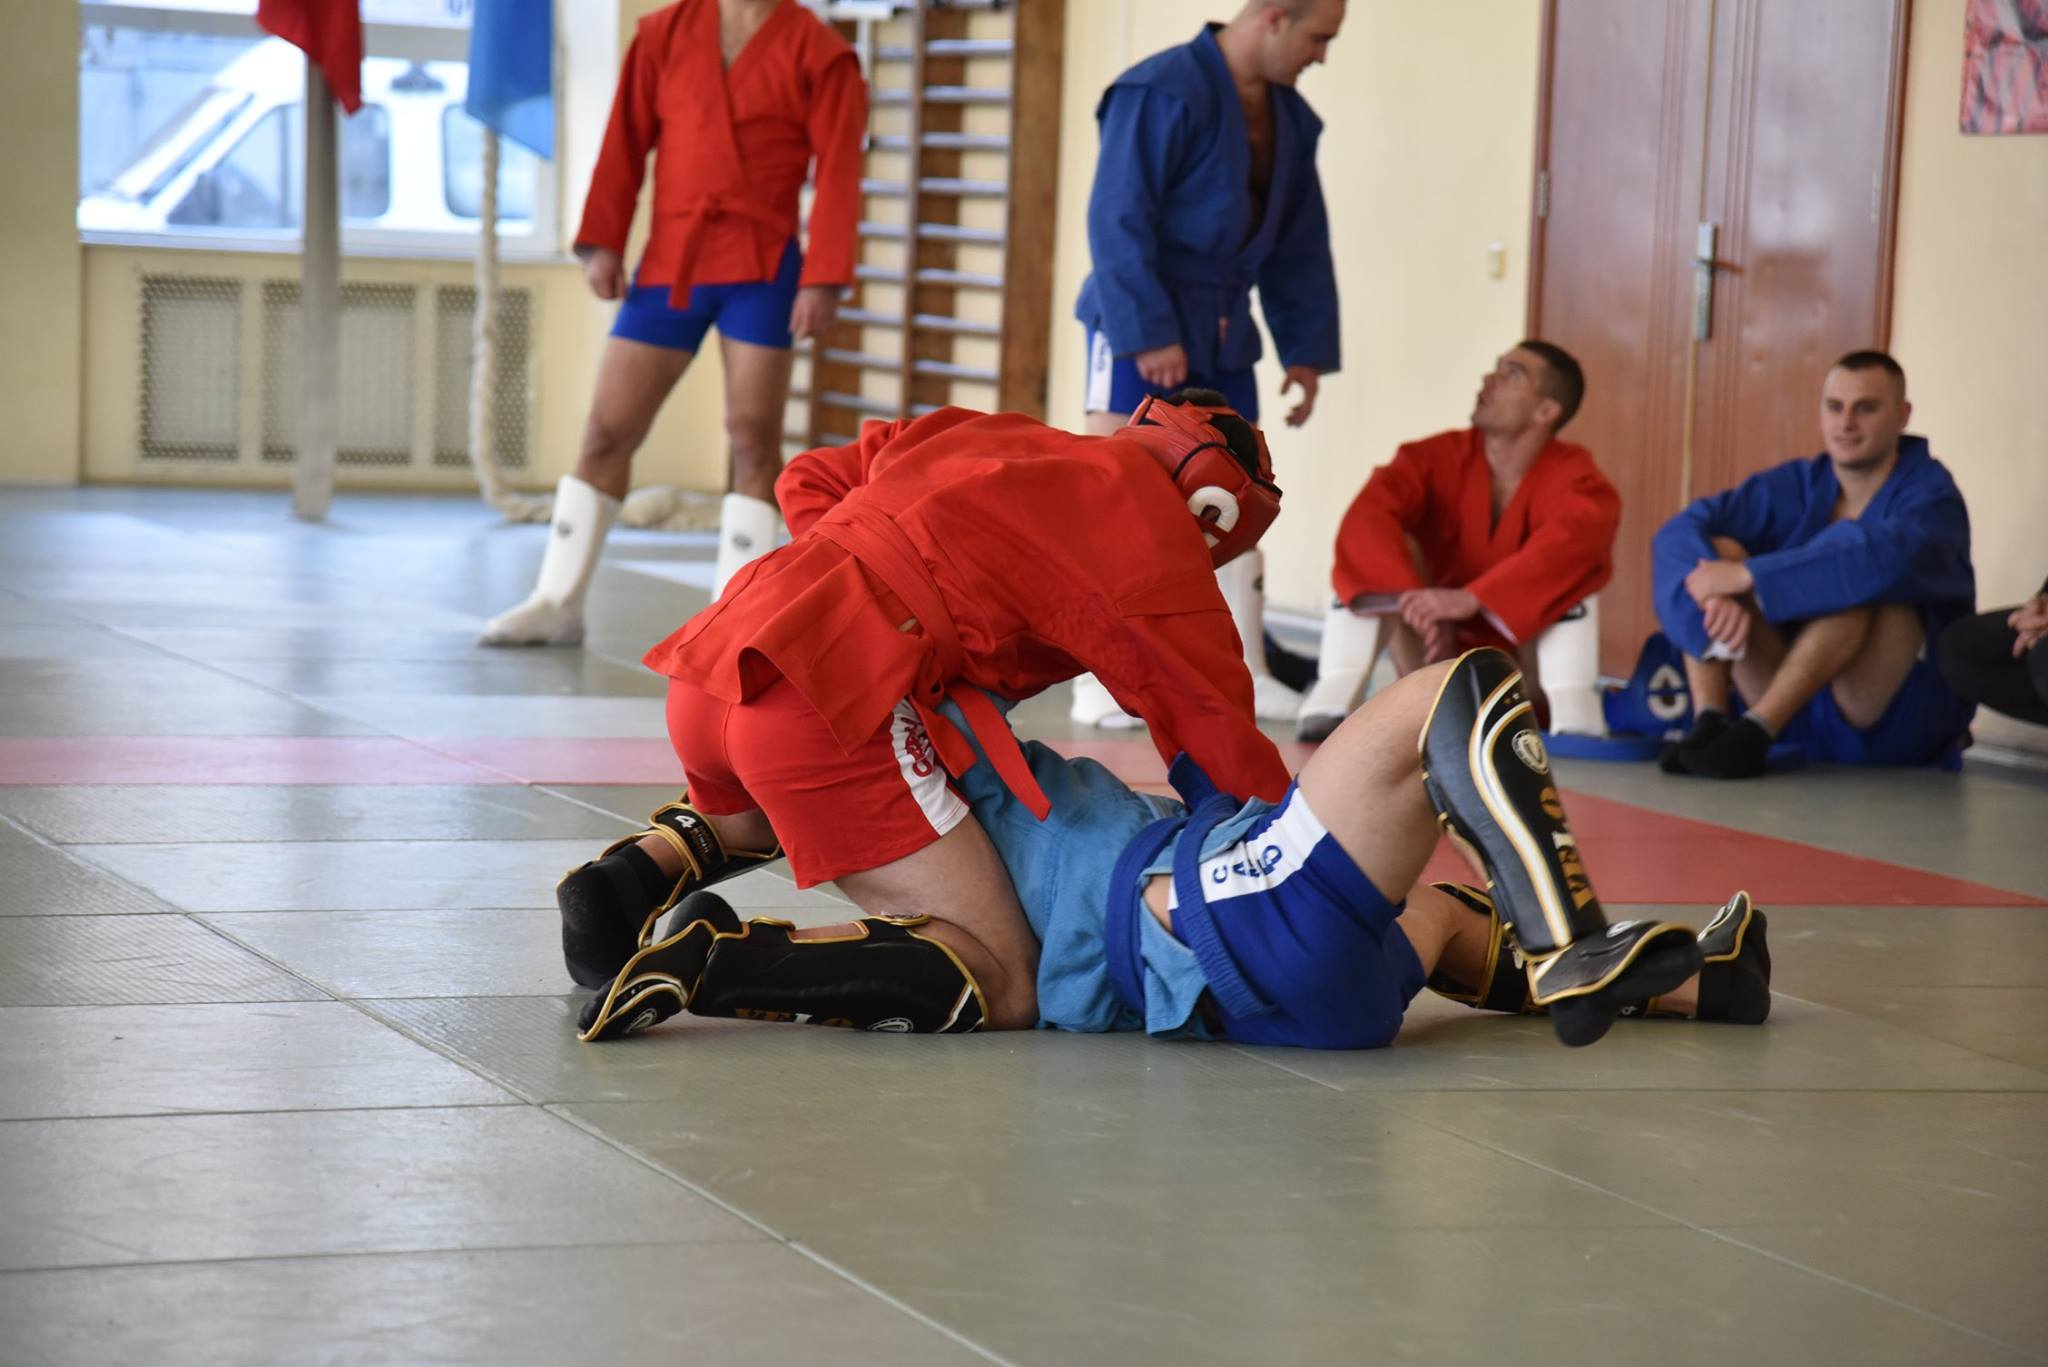 Lupta corp la corp din cadrul Spartachiadei CSC Dinamo 20183